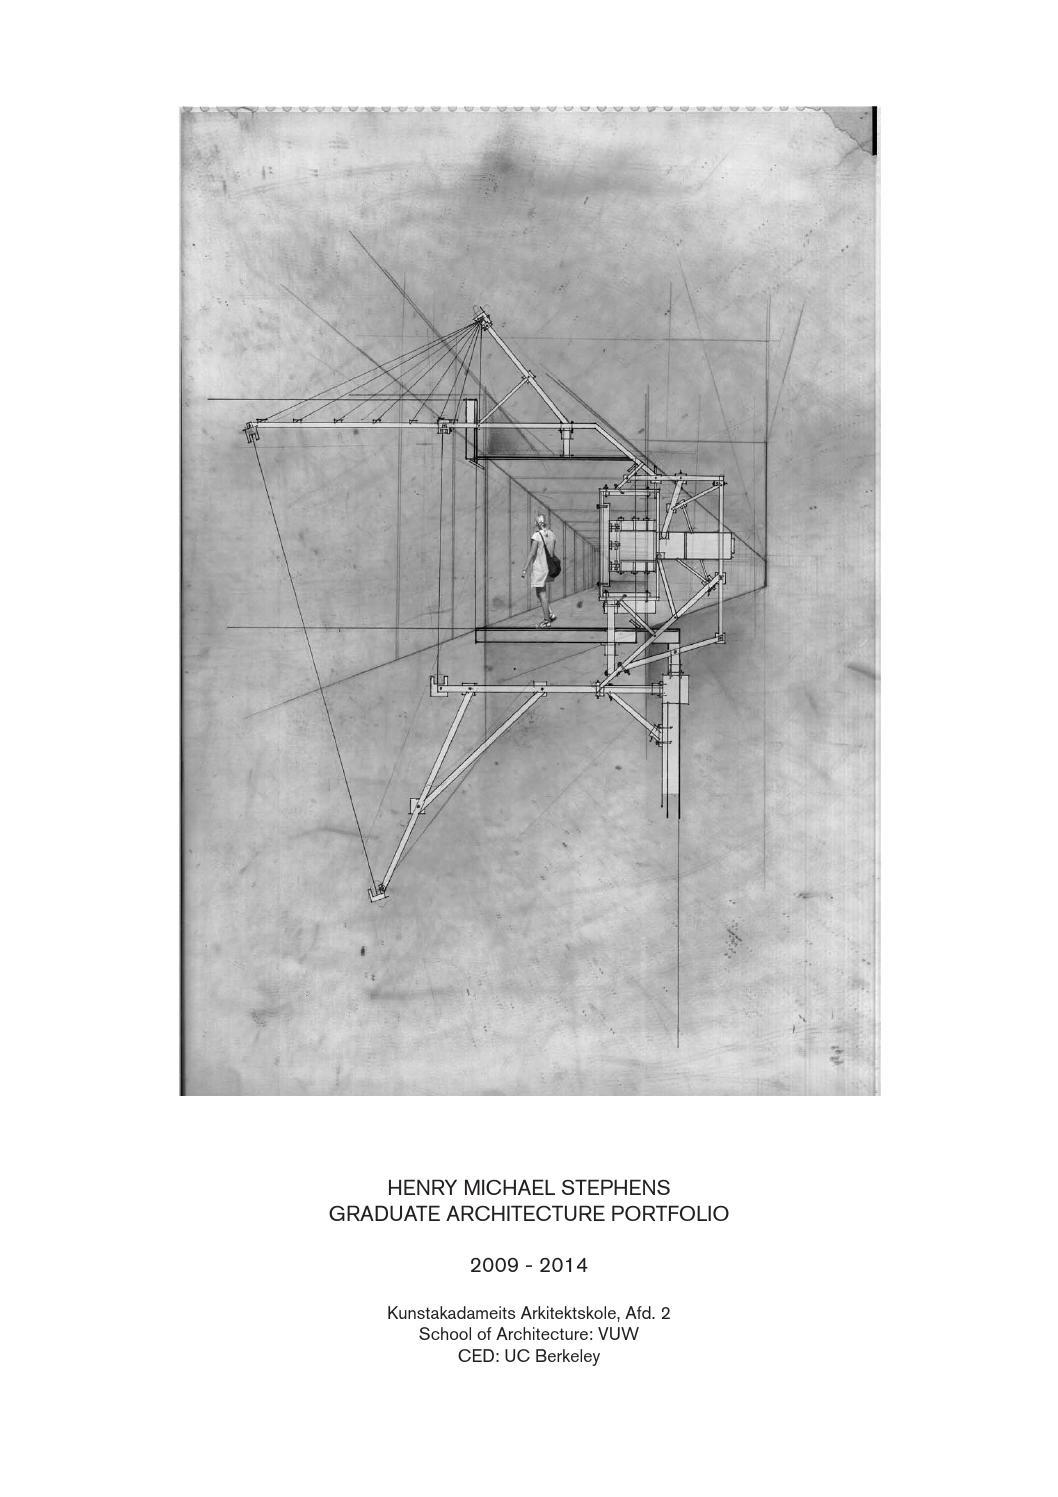 architecture portfolio for masters application